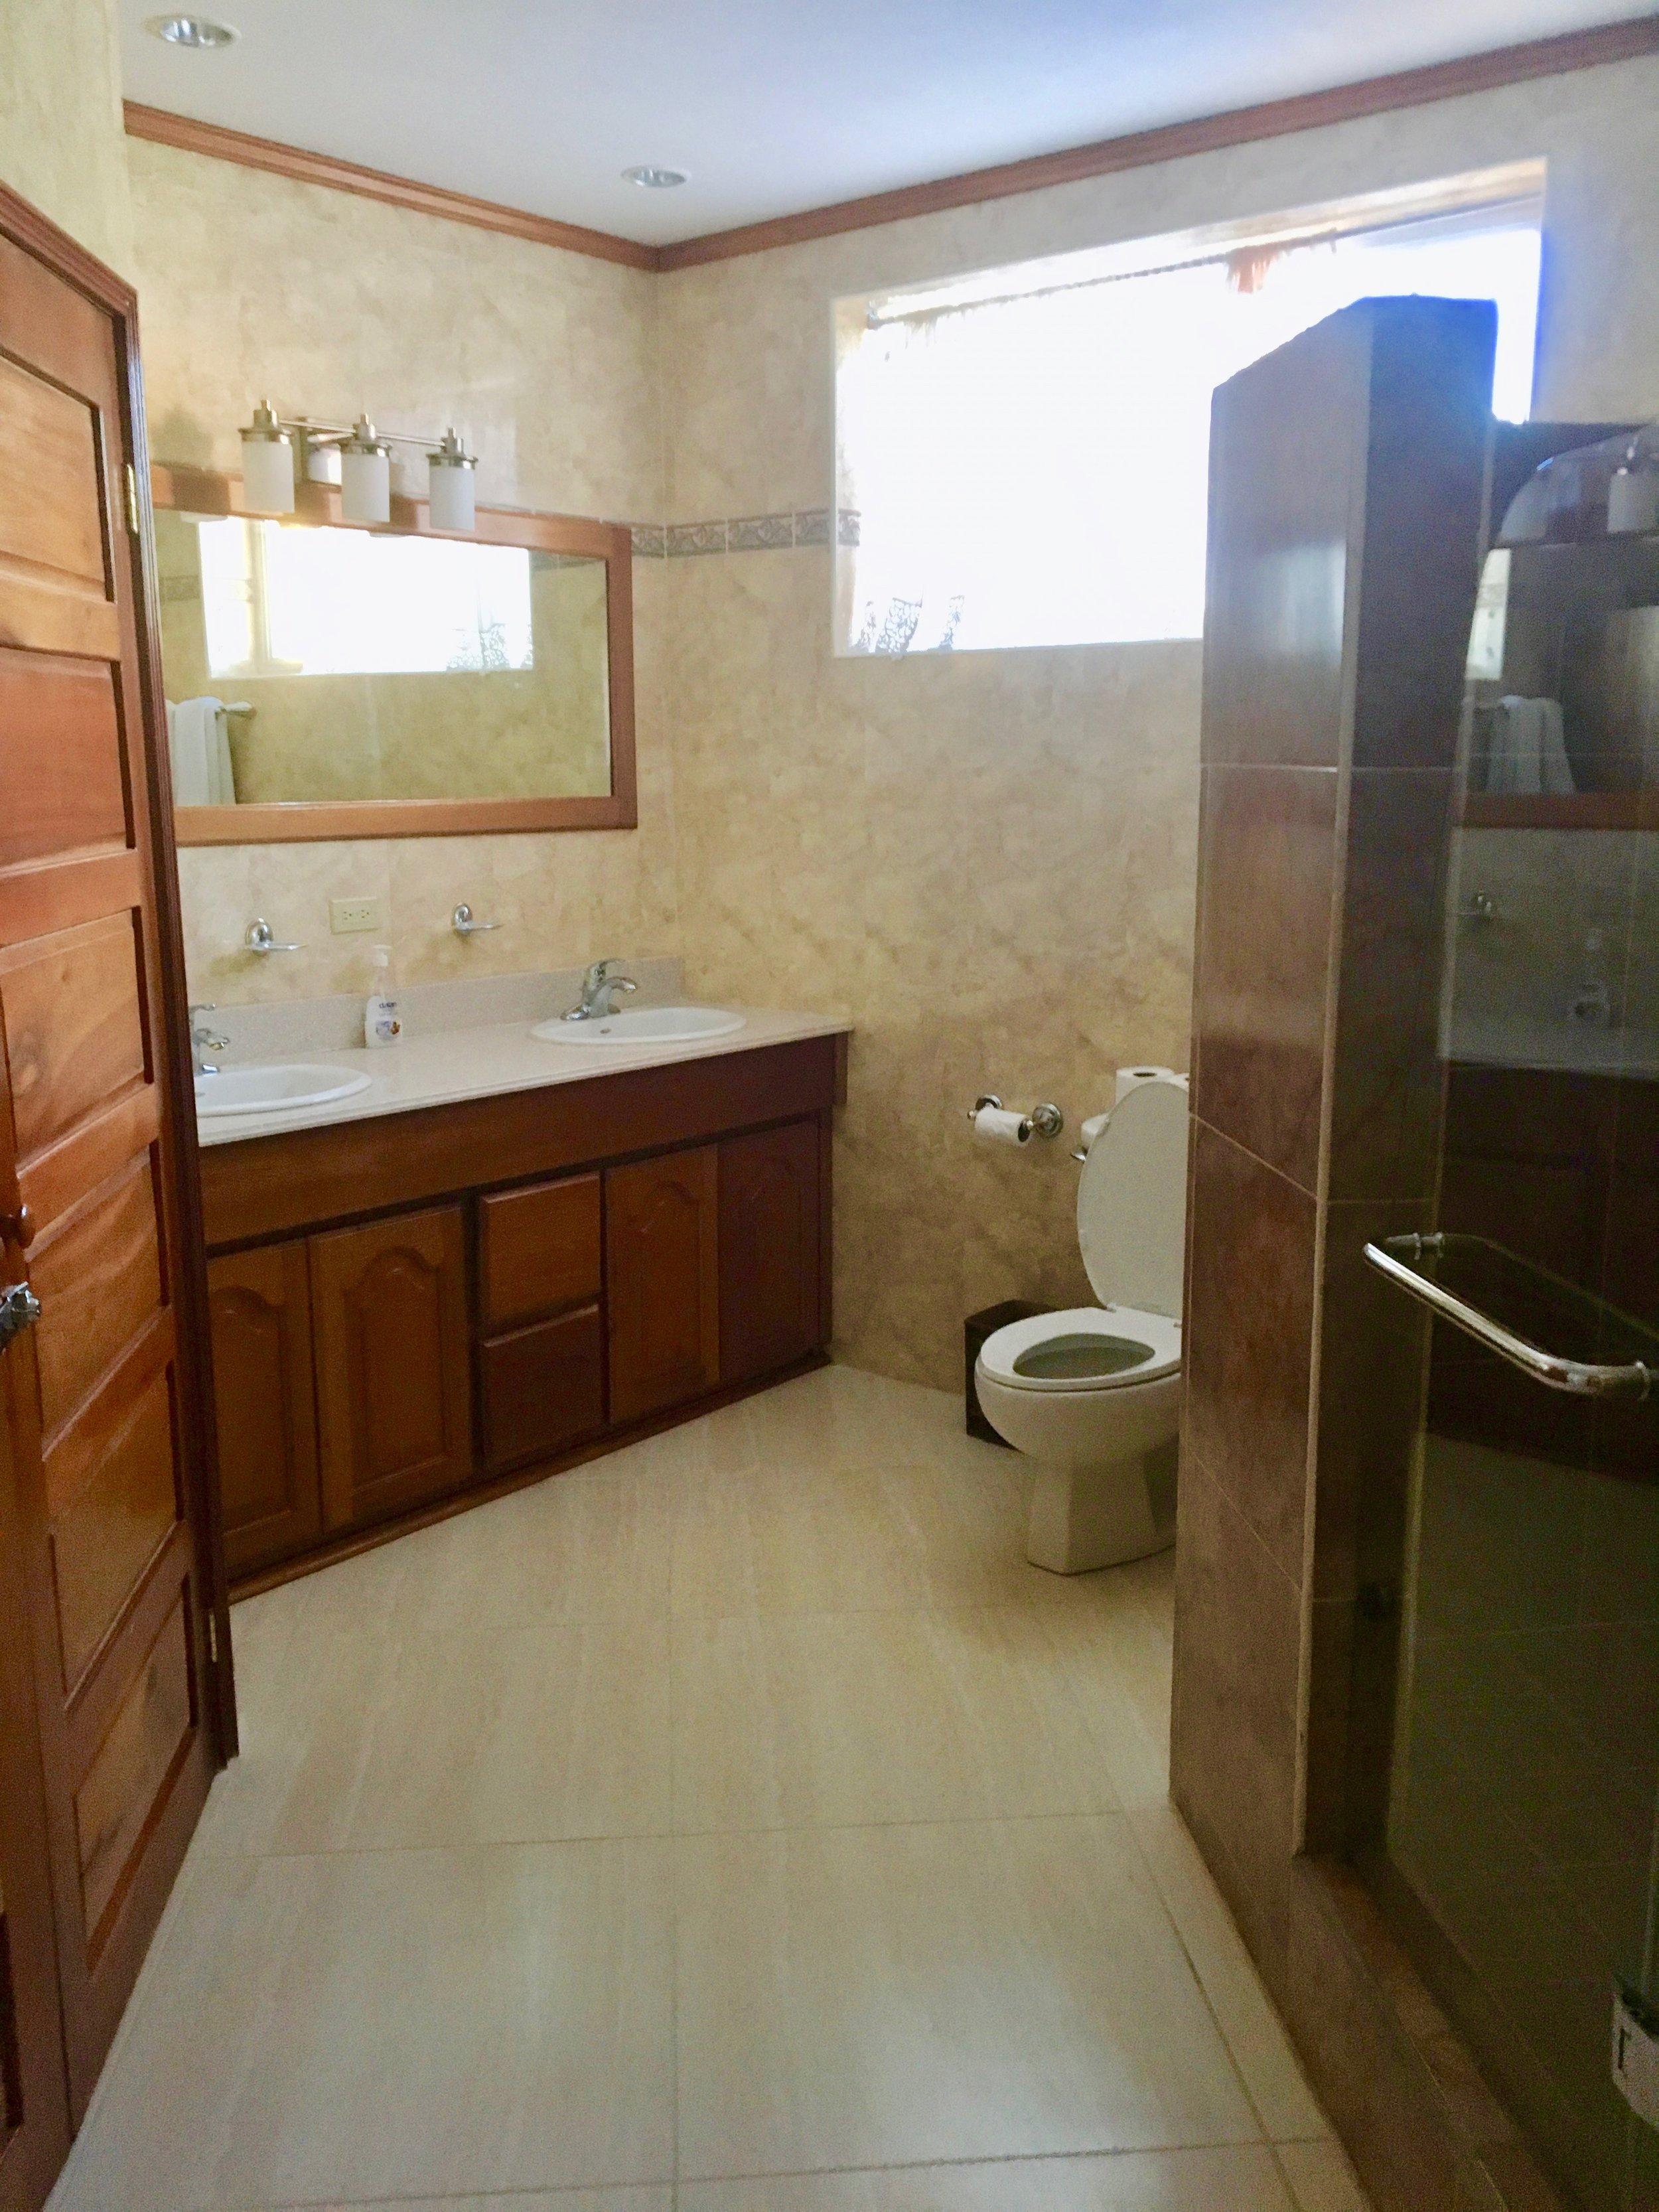 Bathroom of Master Bedroom